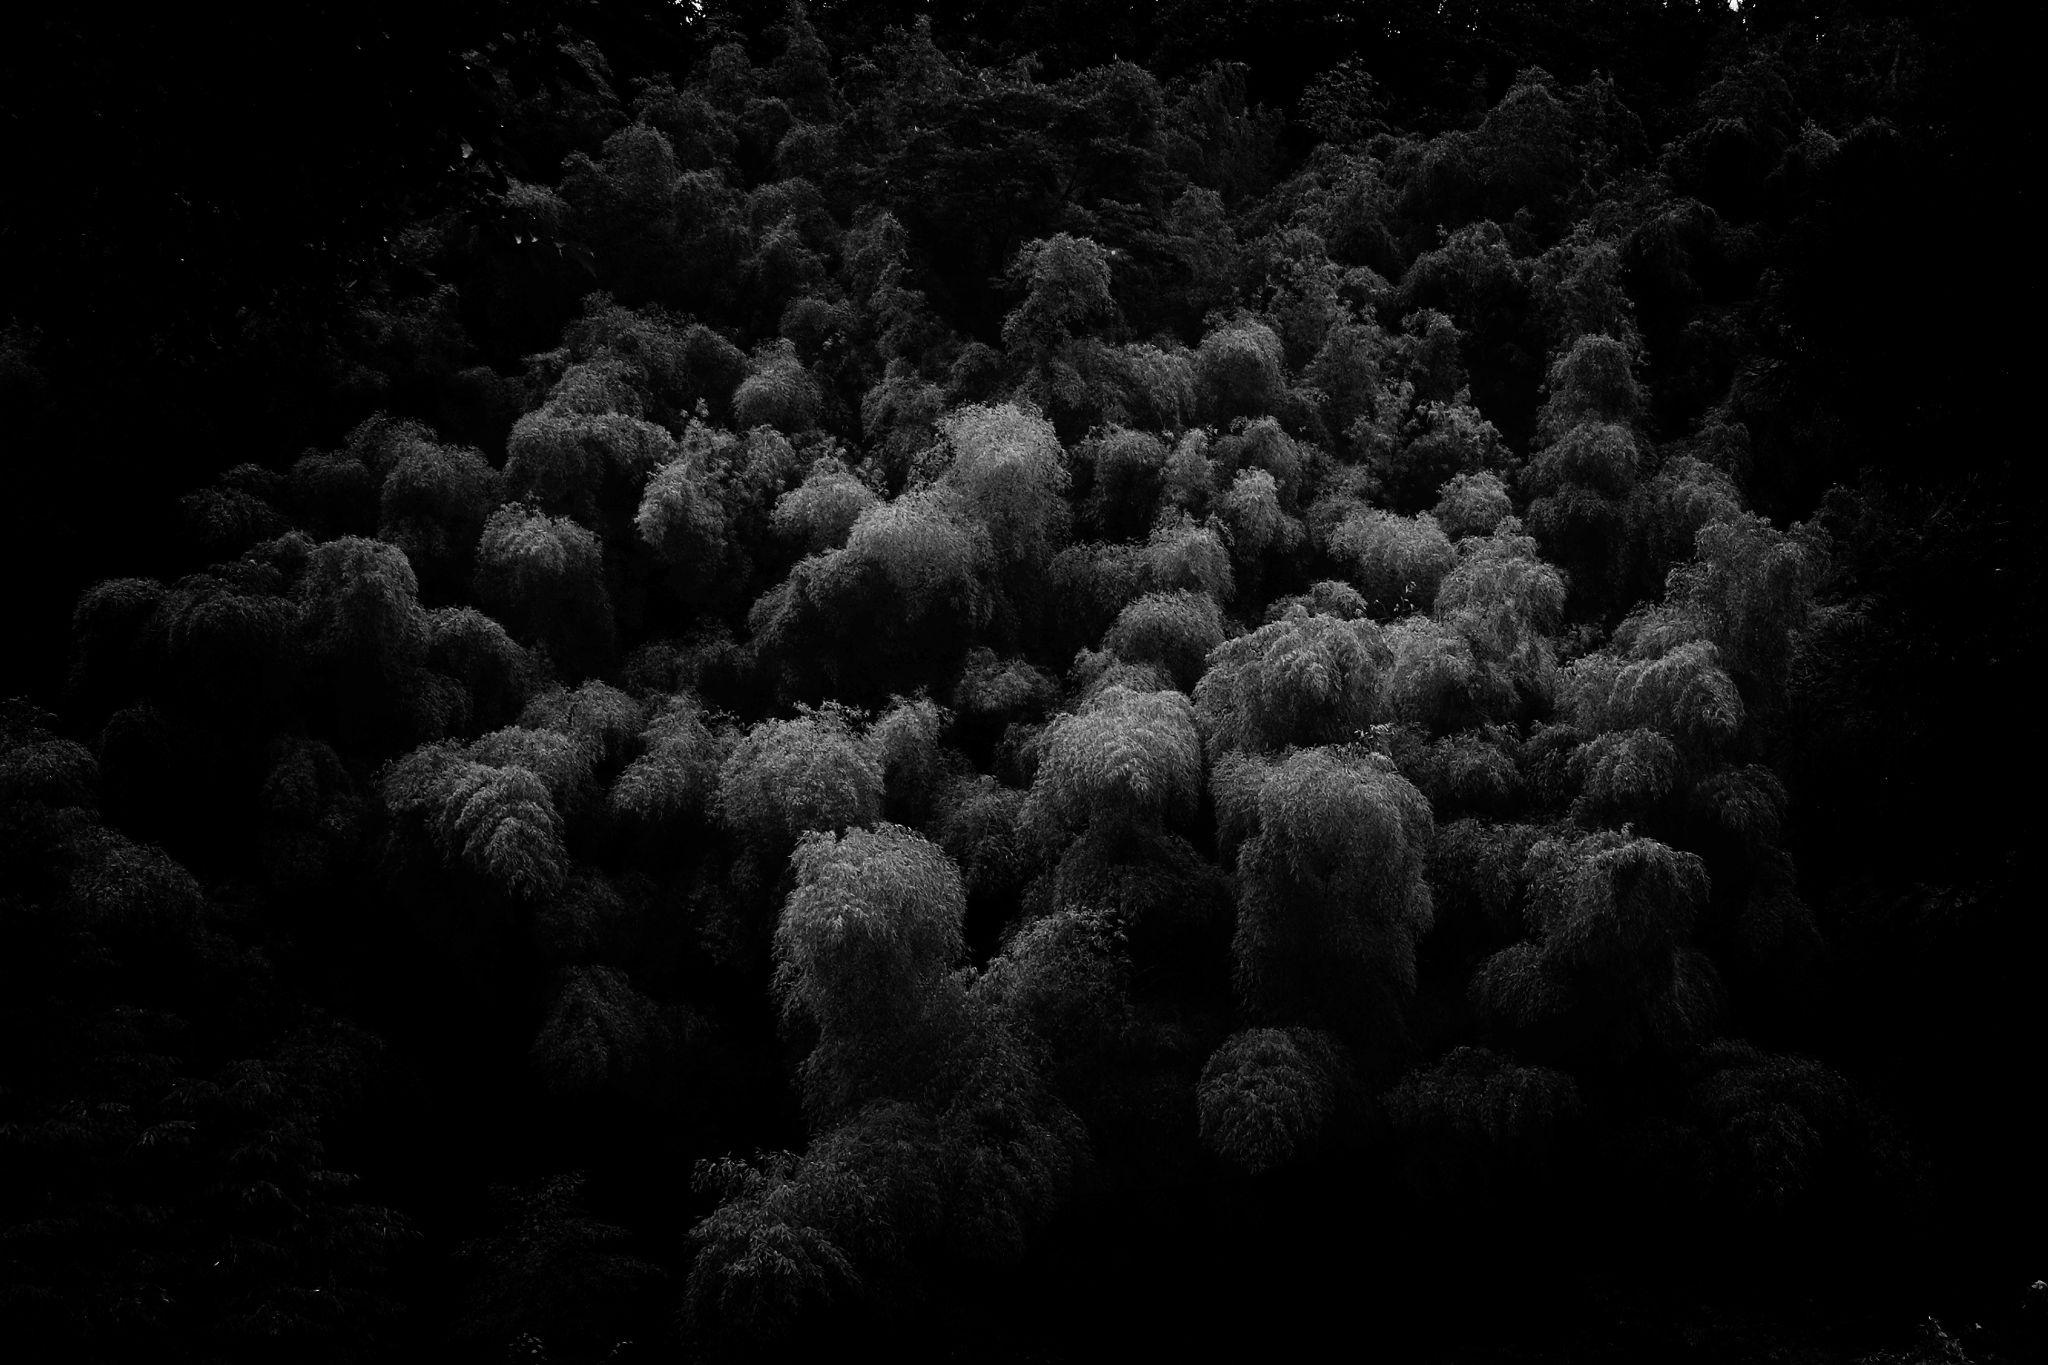 Bamboo forest by Koji Ishimoto